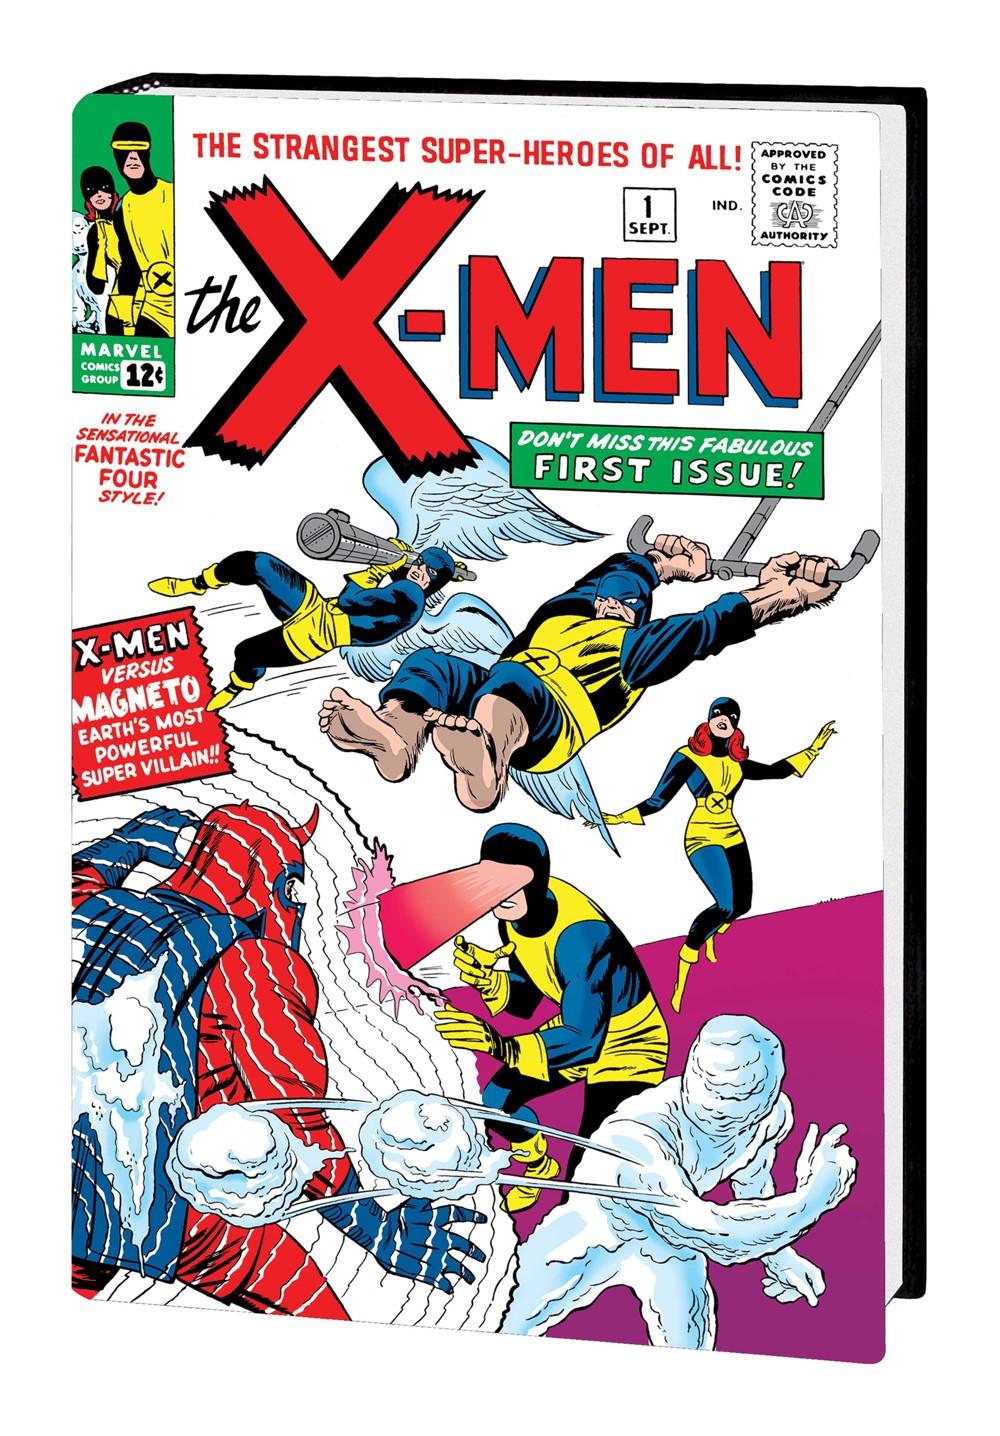 XMEN_OMNI_V1_HC_Kirby Marvel Comics September 2021 Solicitations